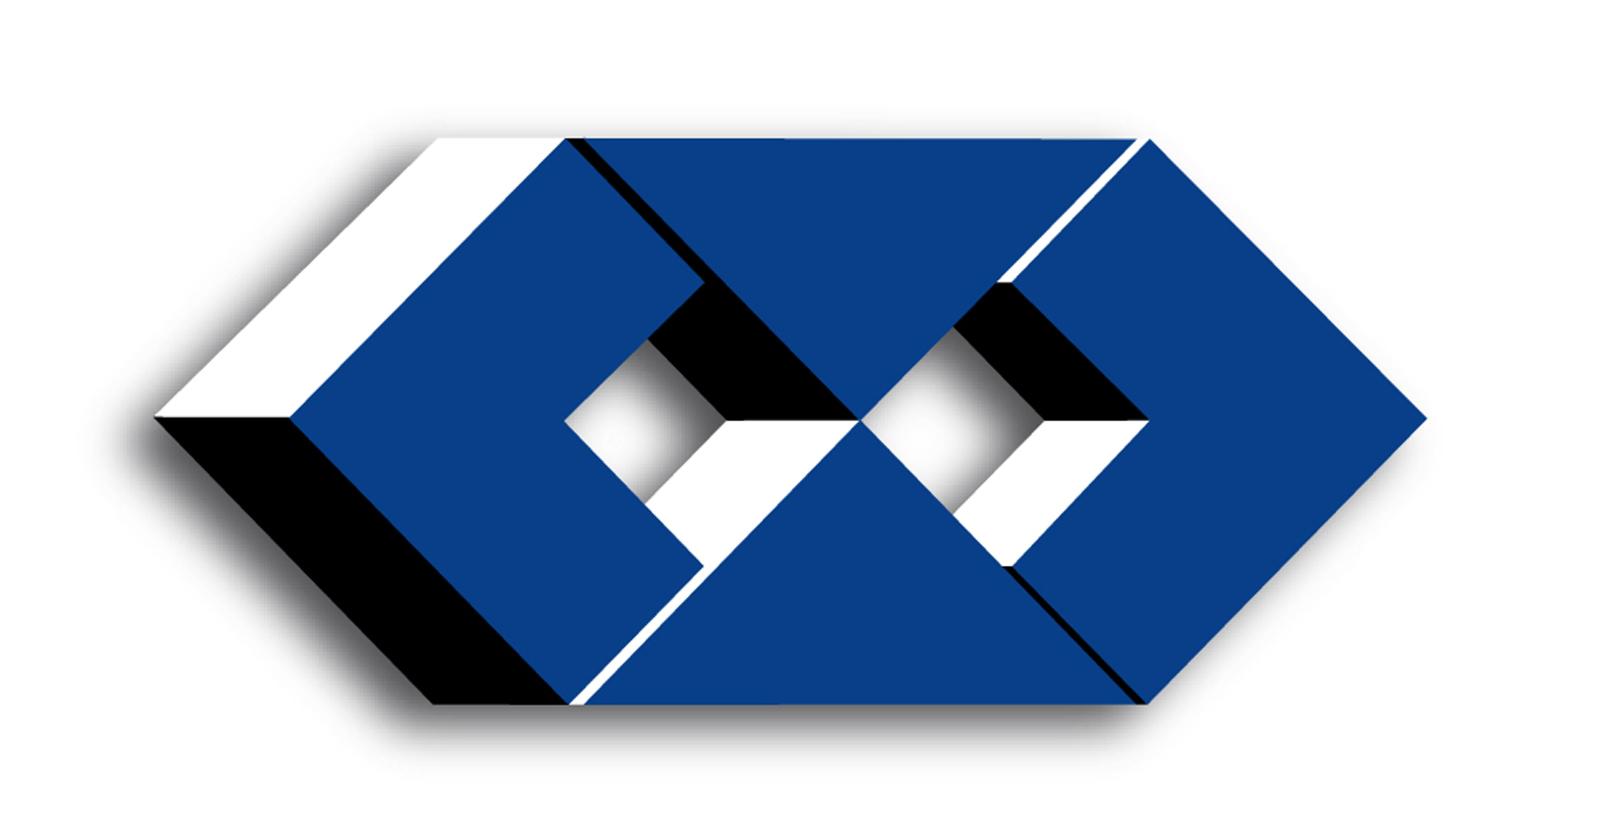 simbolo-administracao-3d.jpg